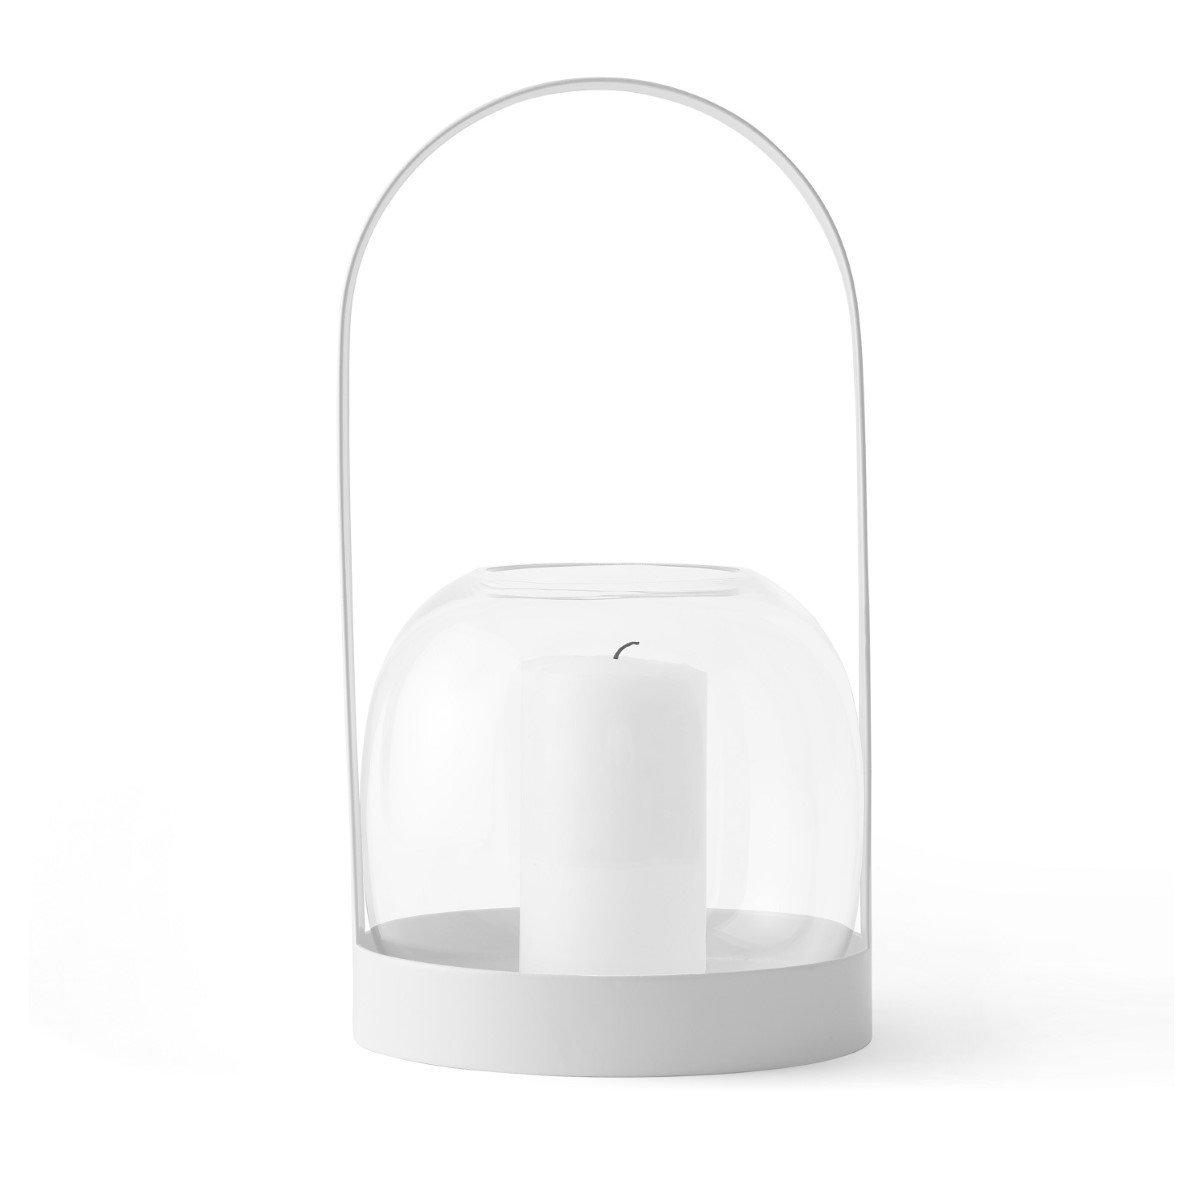 Portavelas jarrón decorativo con asa, estilo minimalista